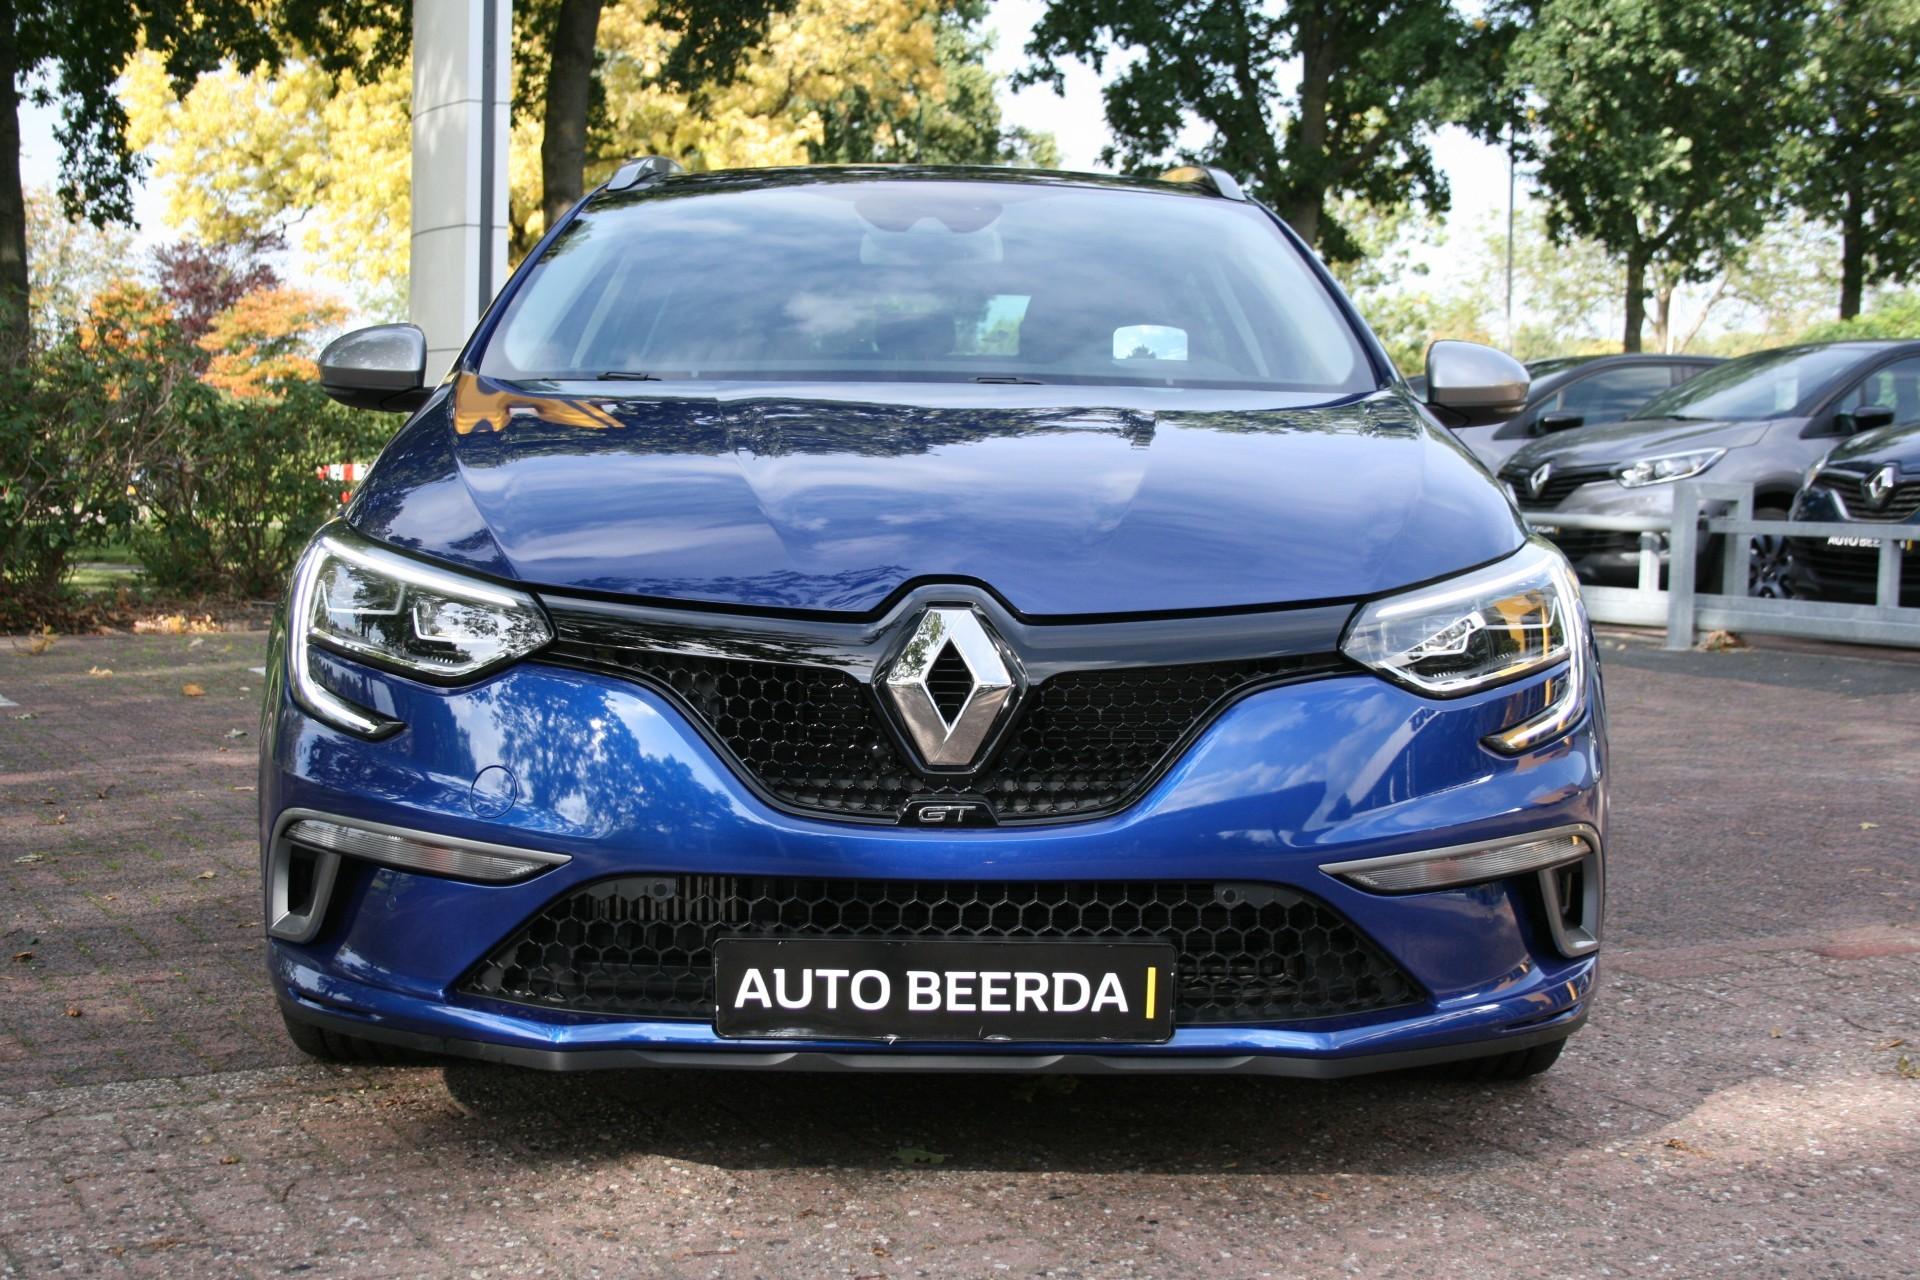 Renault Mégane foto 1